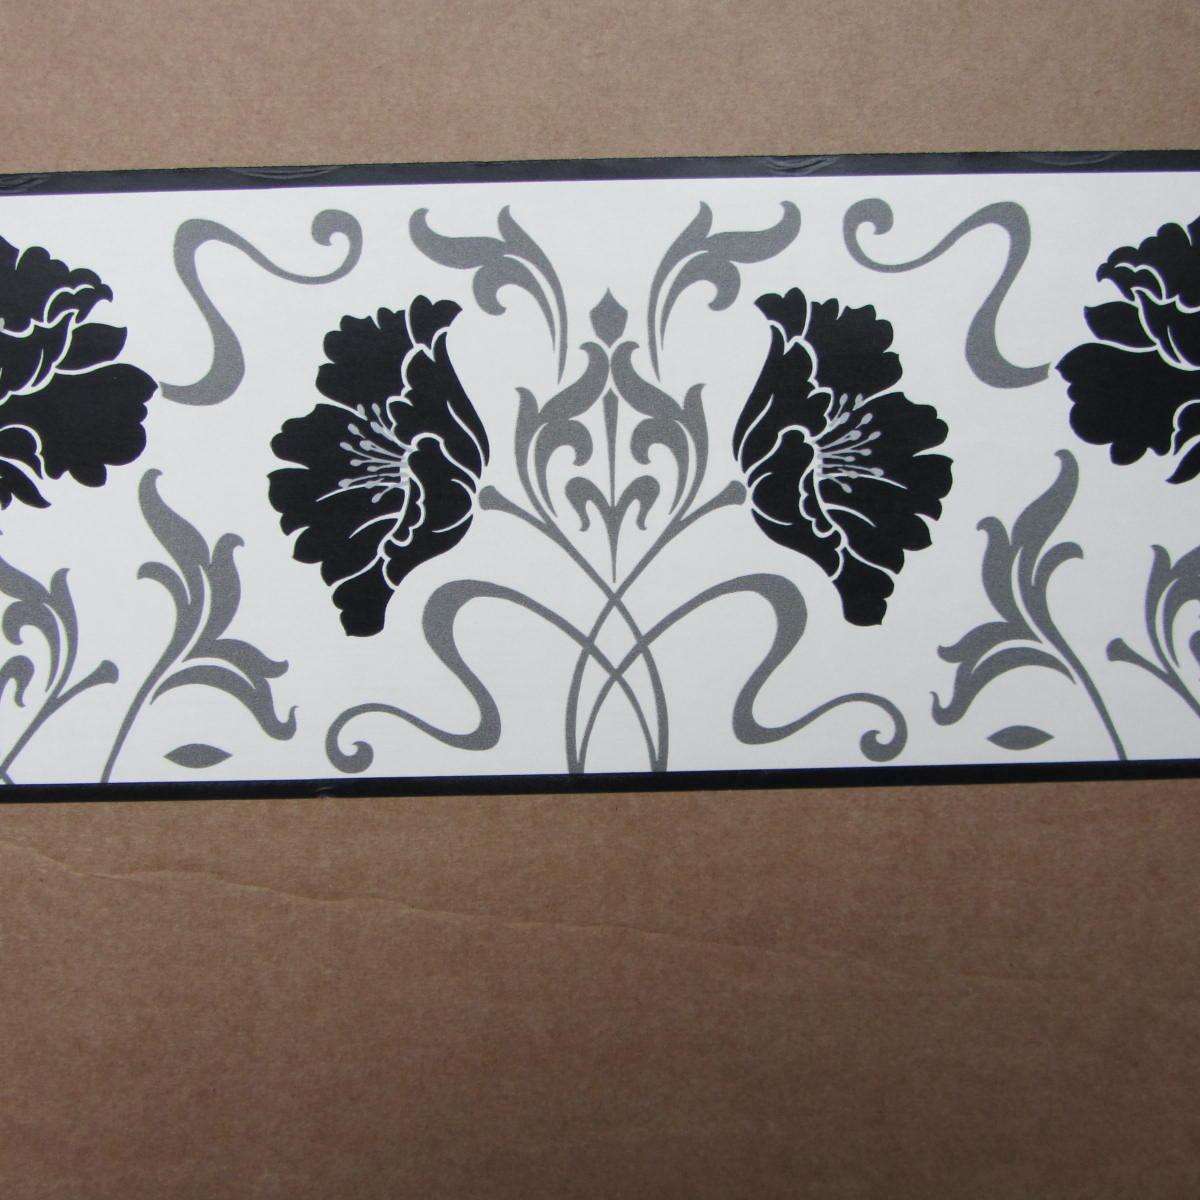 Modern Floral Damask Black White Wallpaper Border Self